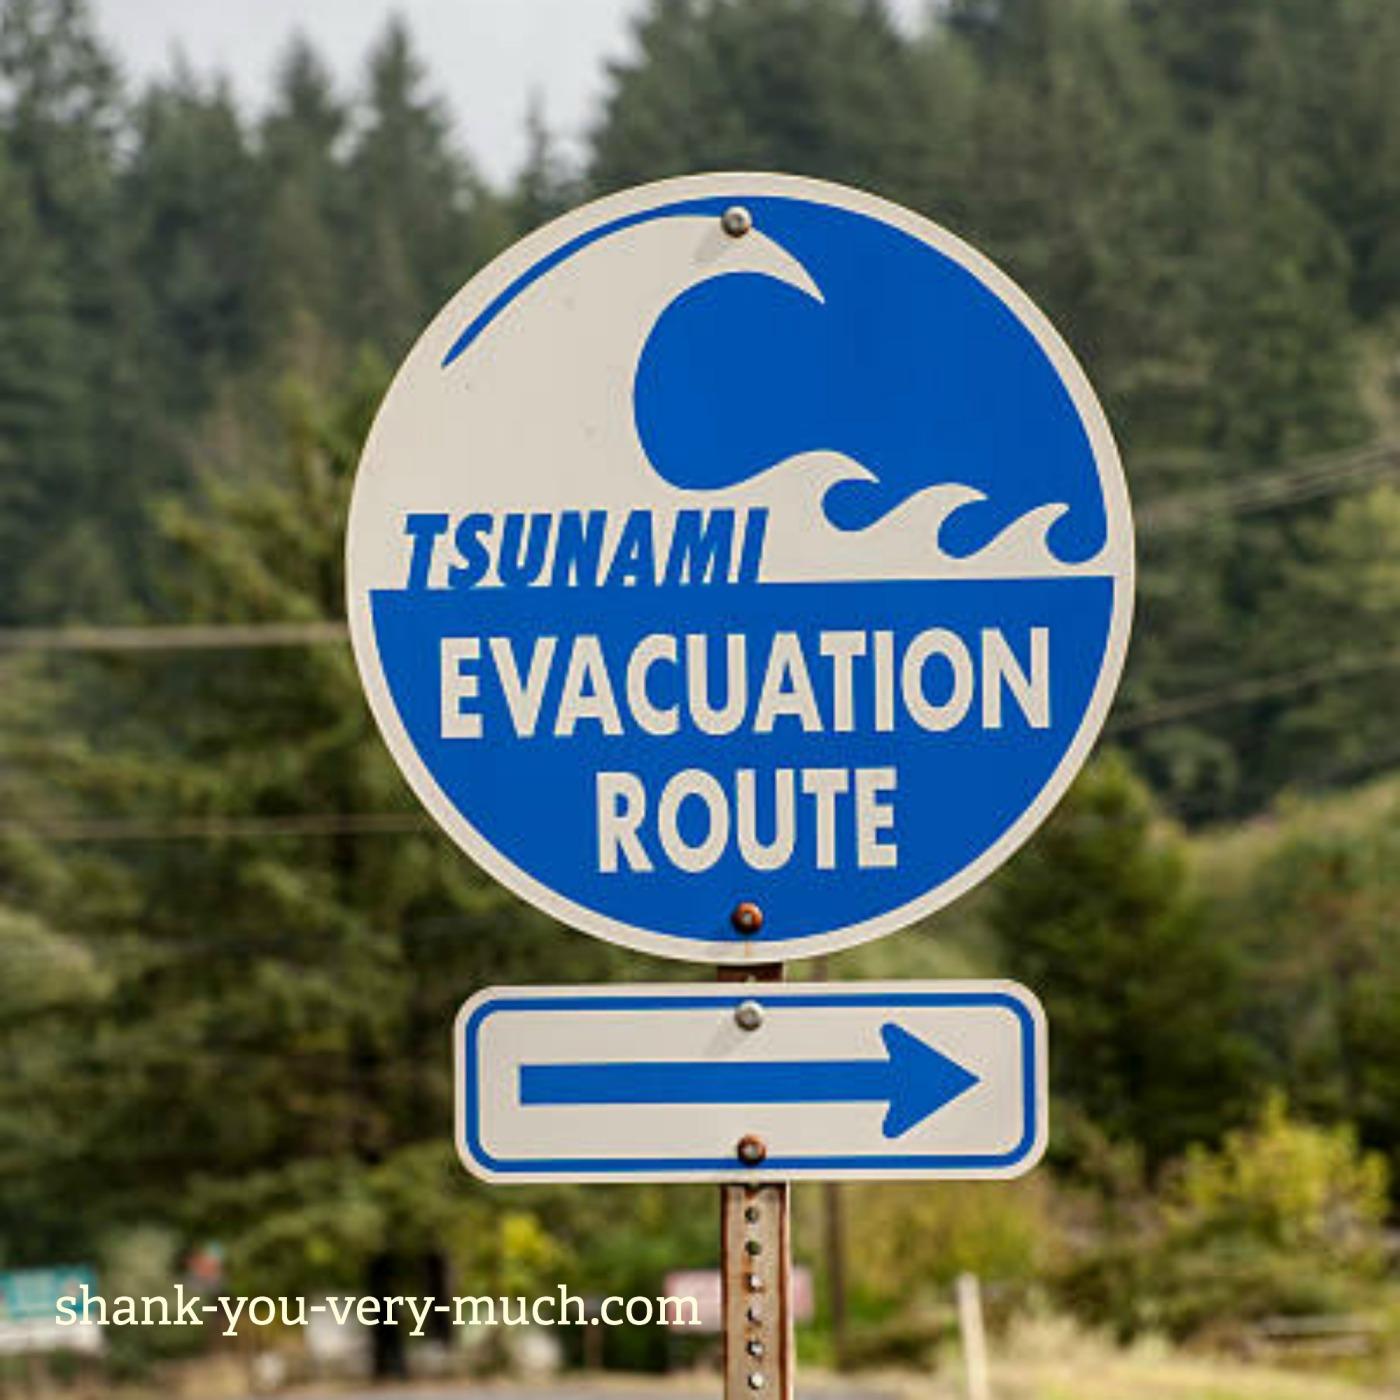 A tsunami evacuation street sign with directional arrow